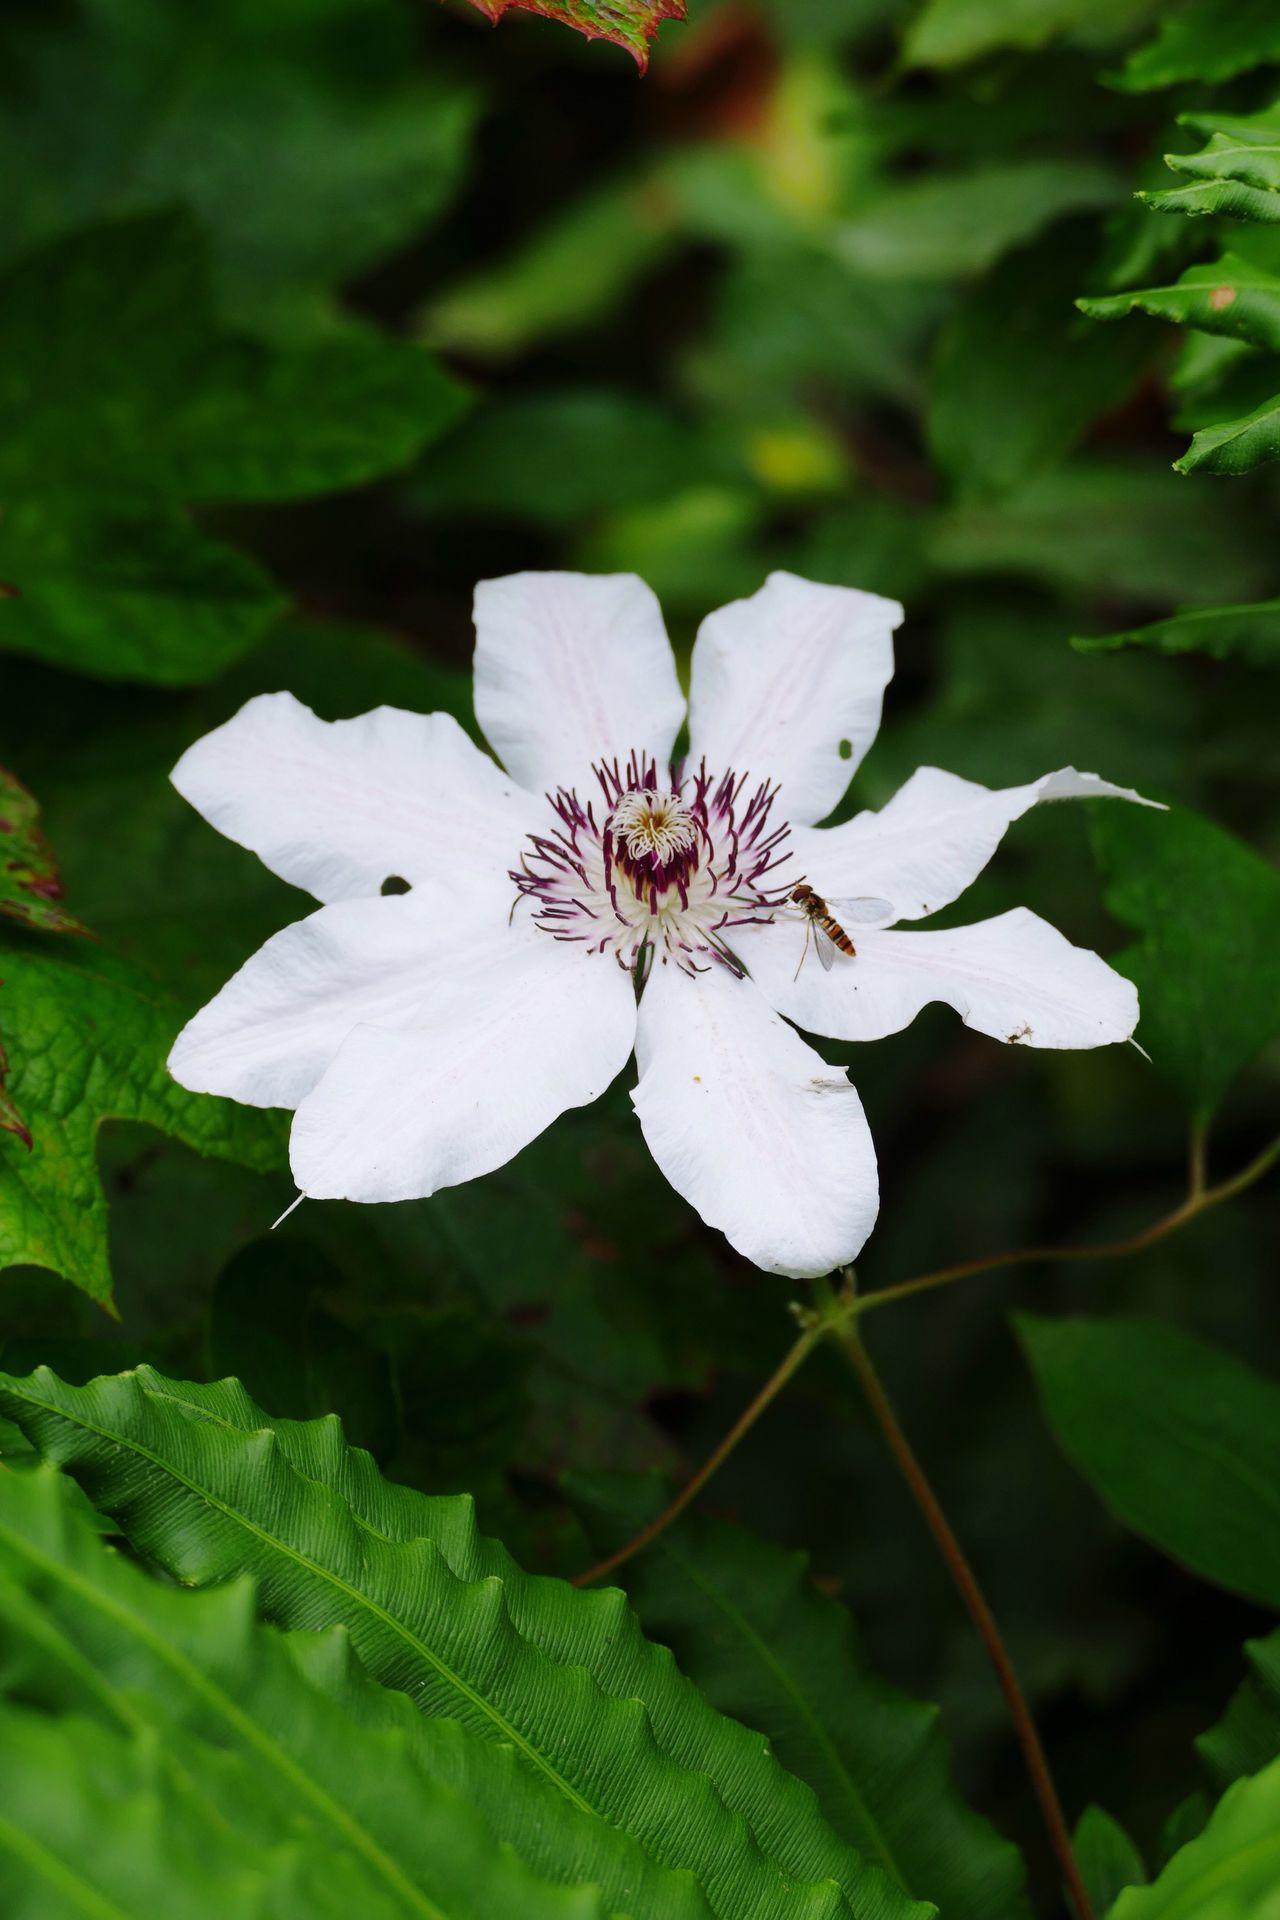 Flowers,Plants & Garden Clematis Flower Clematis Flower Beauty In Nature Single Flower Beauty In Nature Nature's Diversities Flowers, Nature And Beauty Natures Diversities Nature On Your Doorstep Single Flower White White Flower